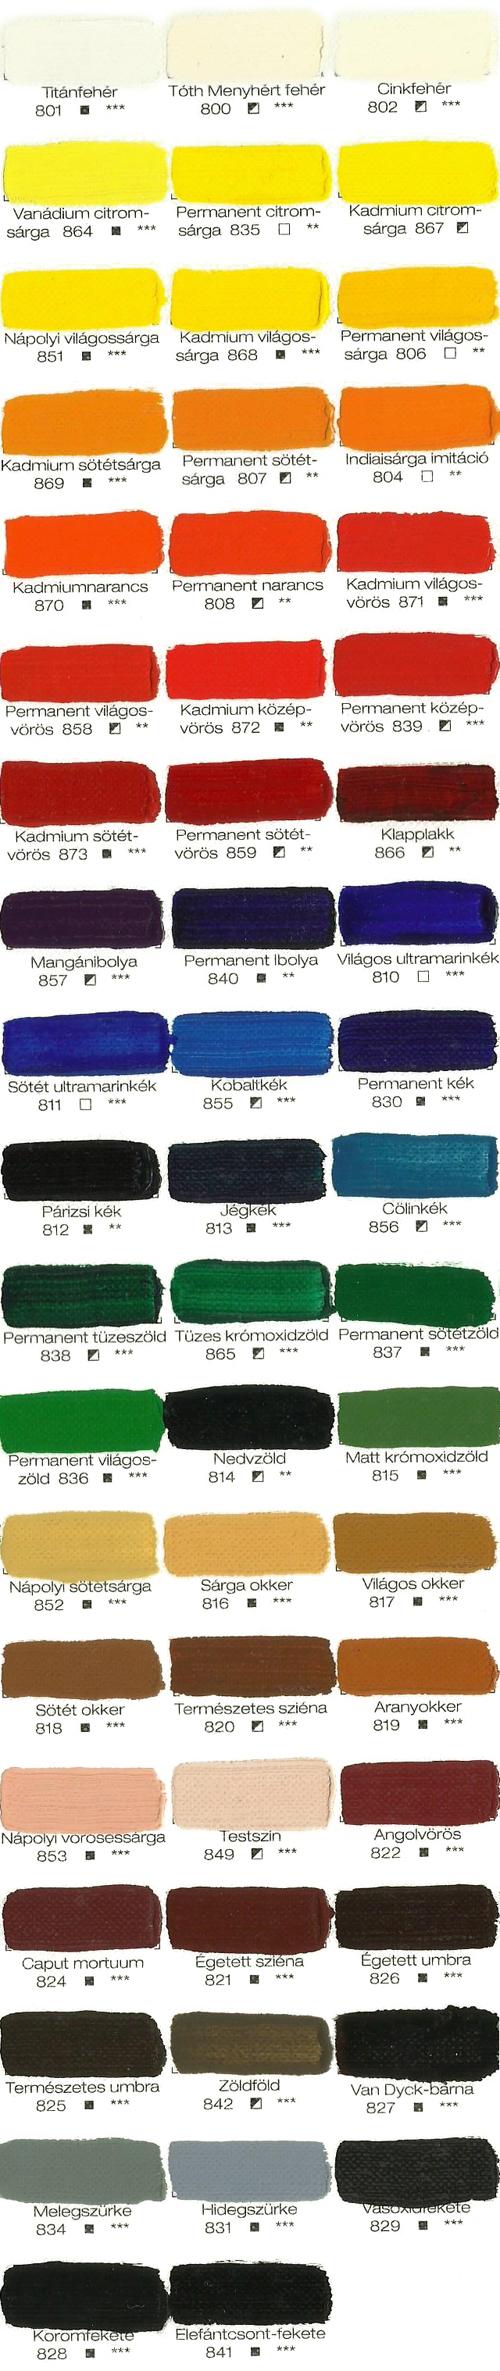 Pannoncolor Olajfesték színskála